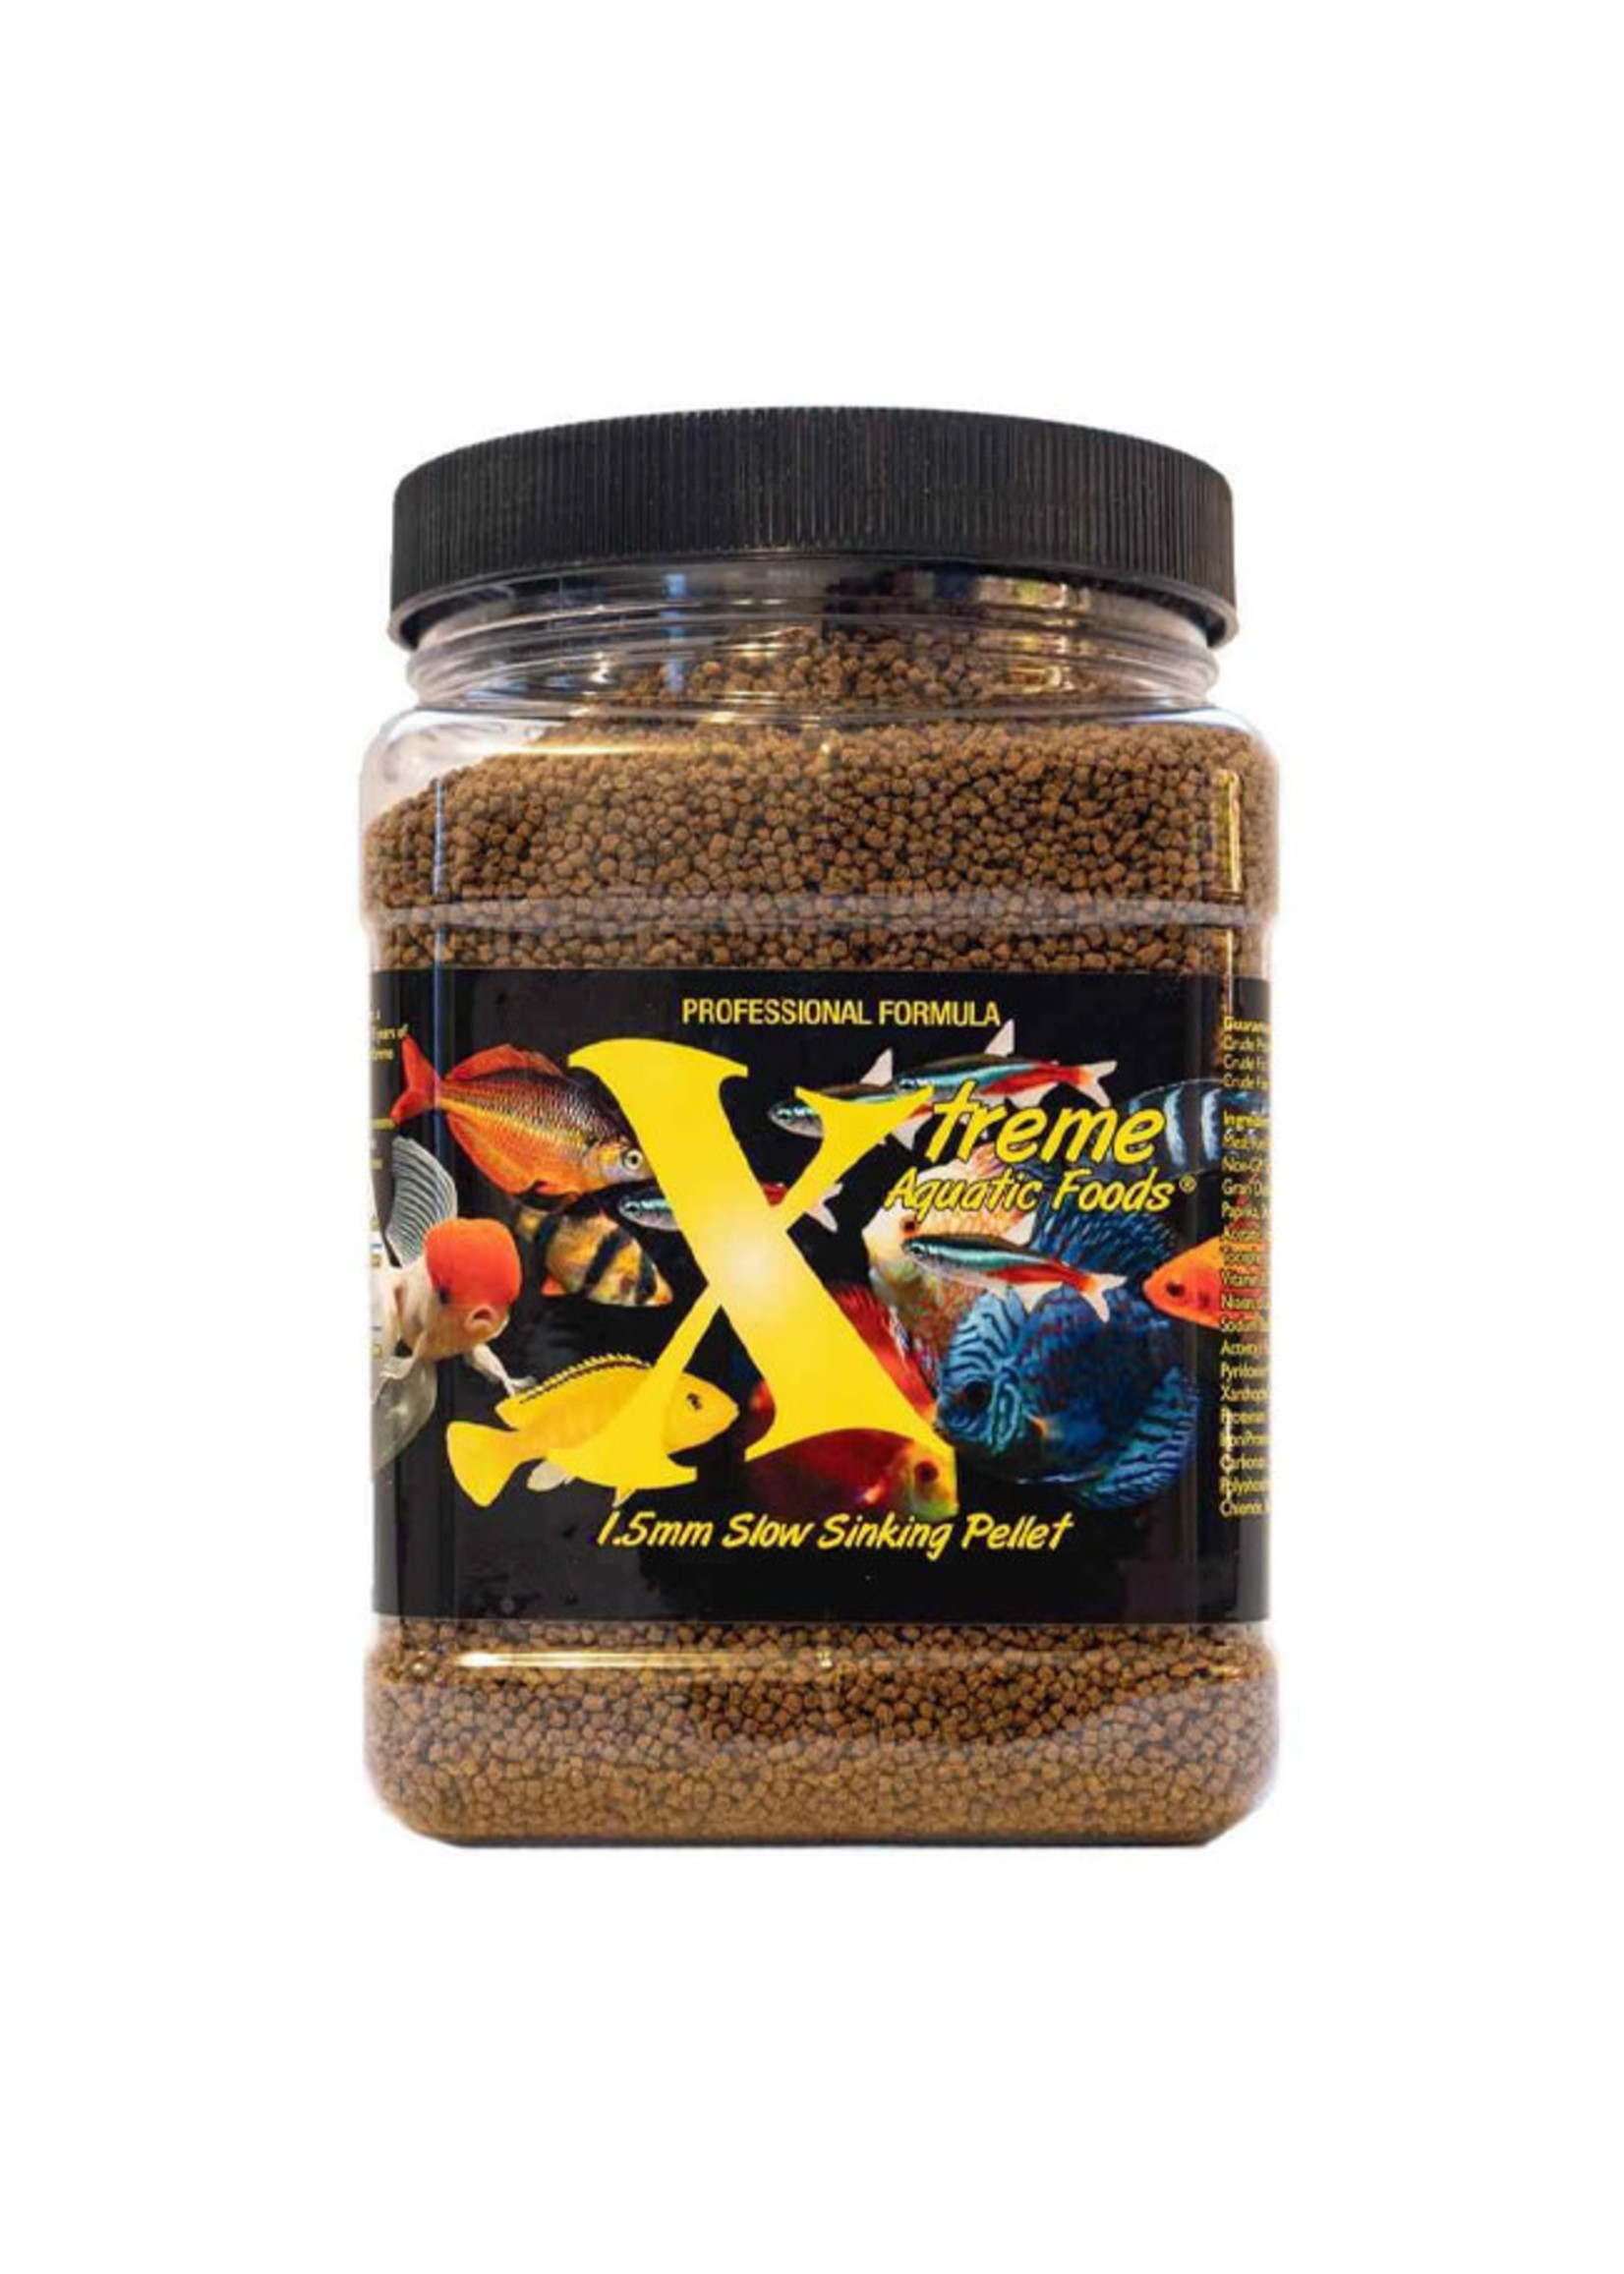 Xtreme Aquatic Foods Xtreme Nice Pellets